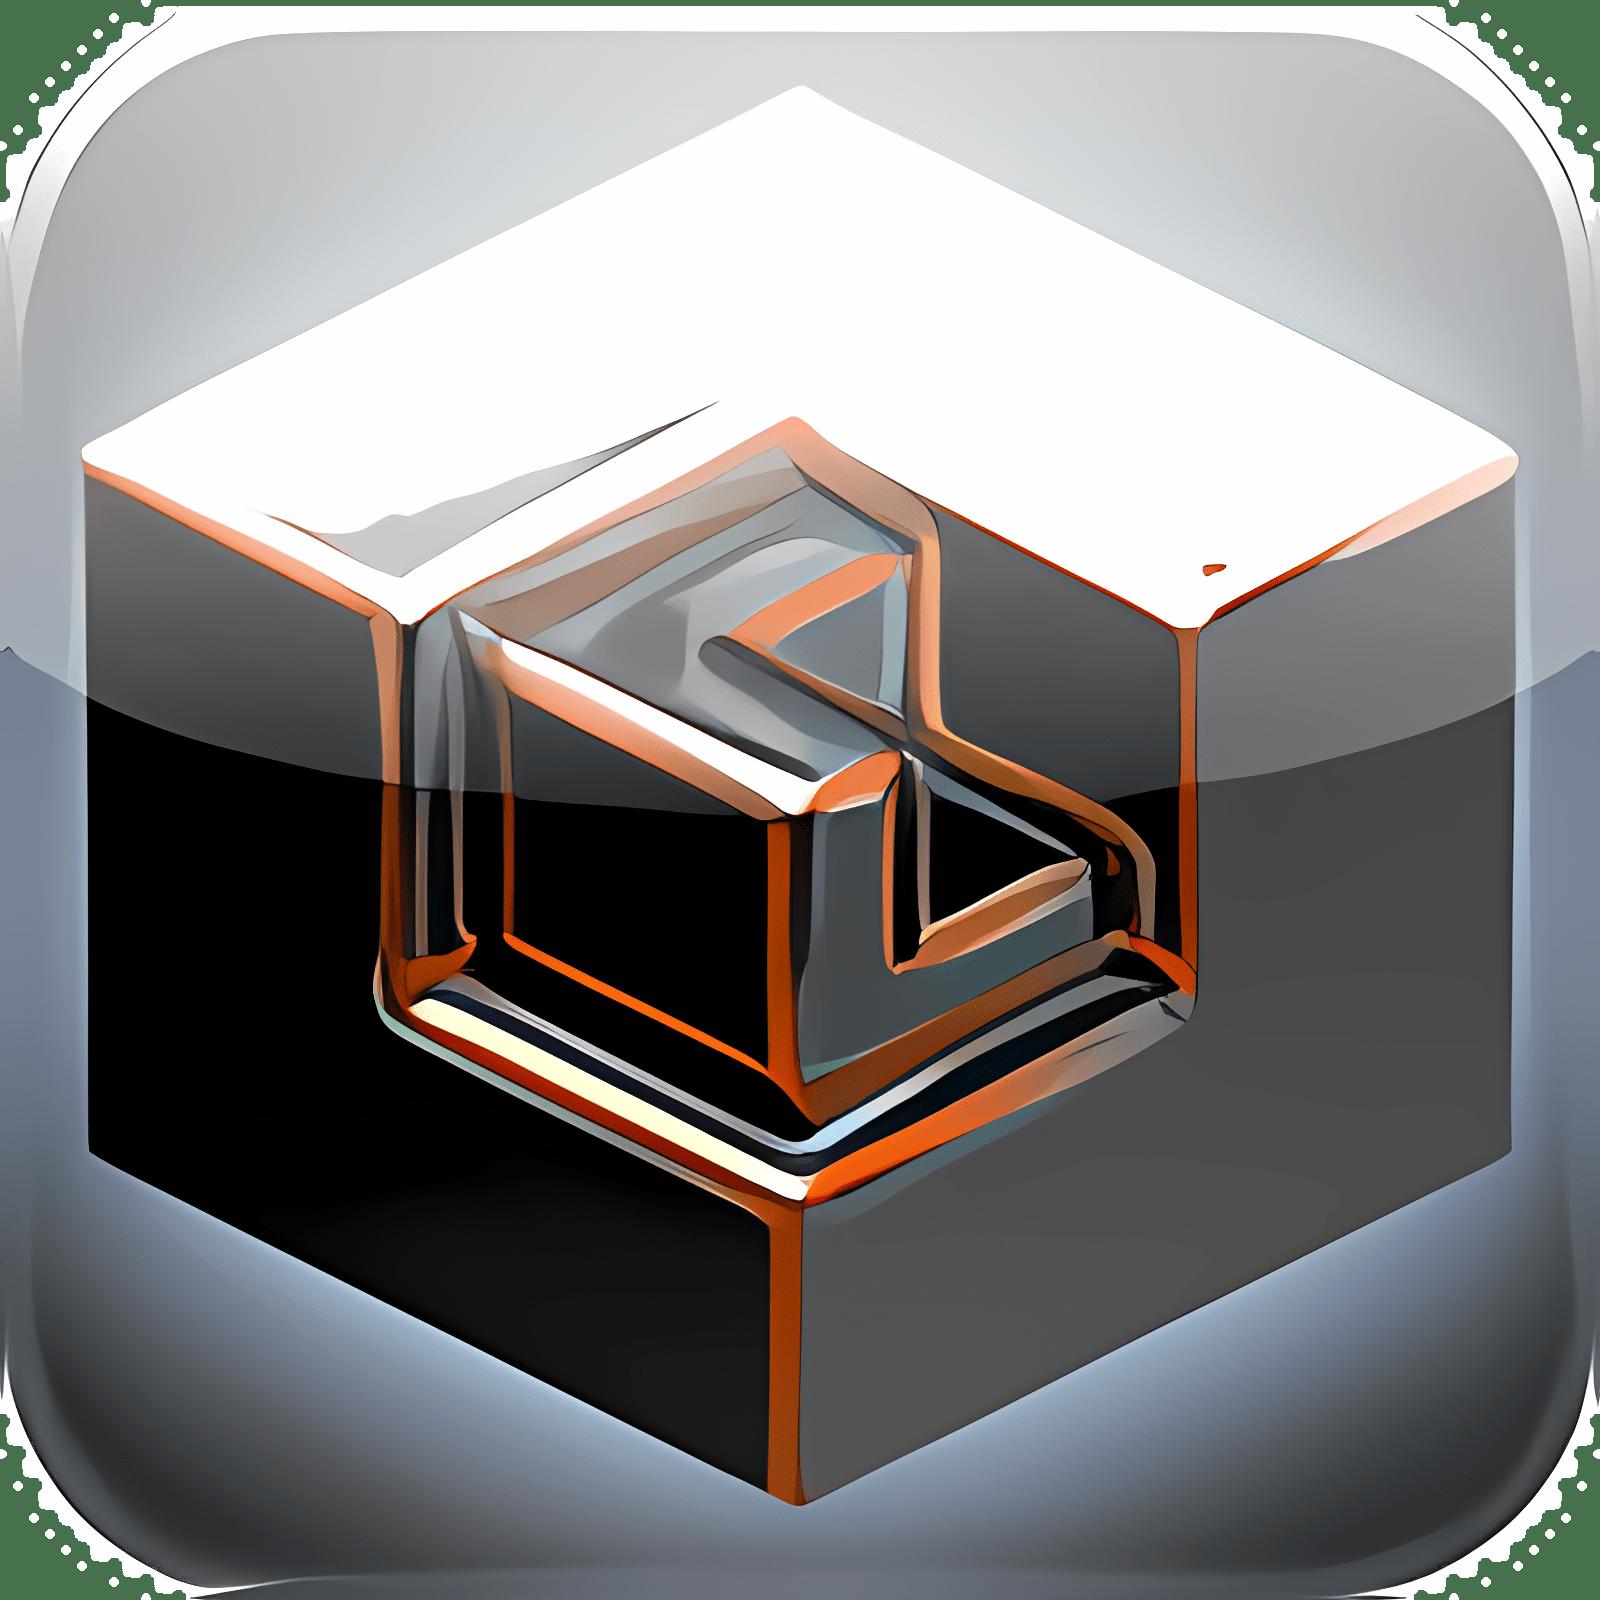 Cube 1.7.1